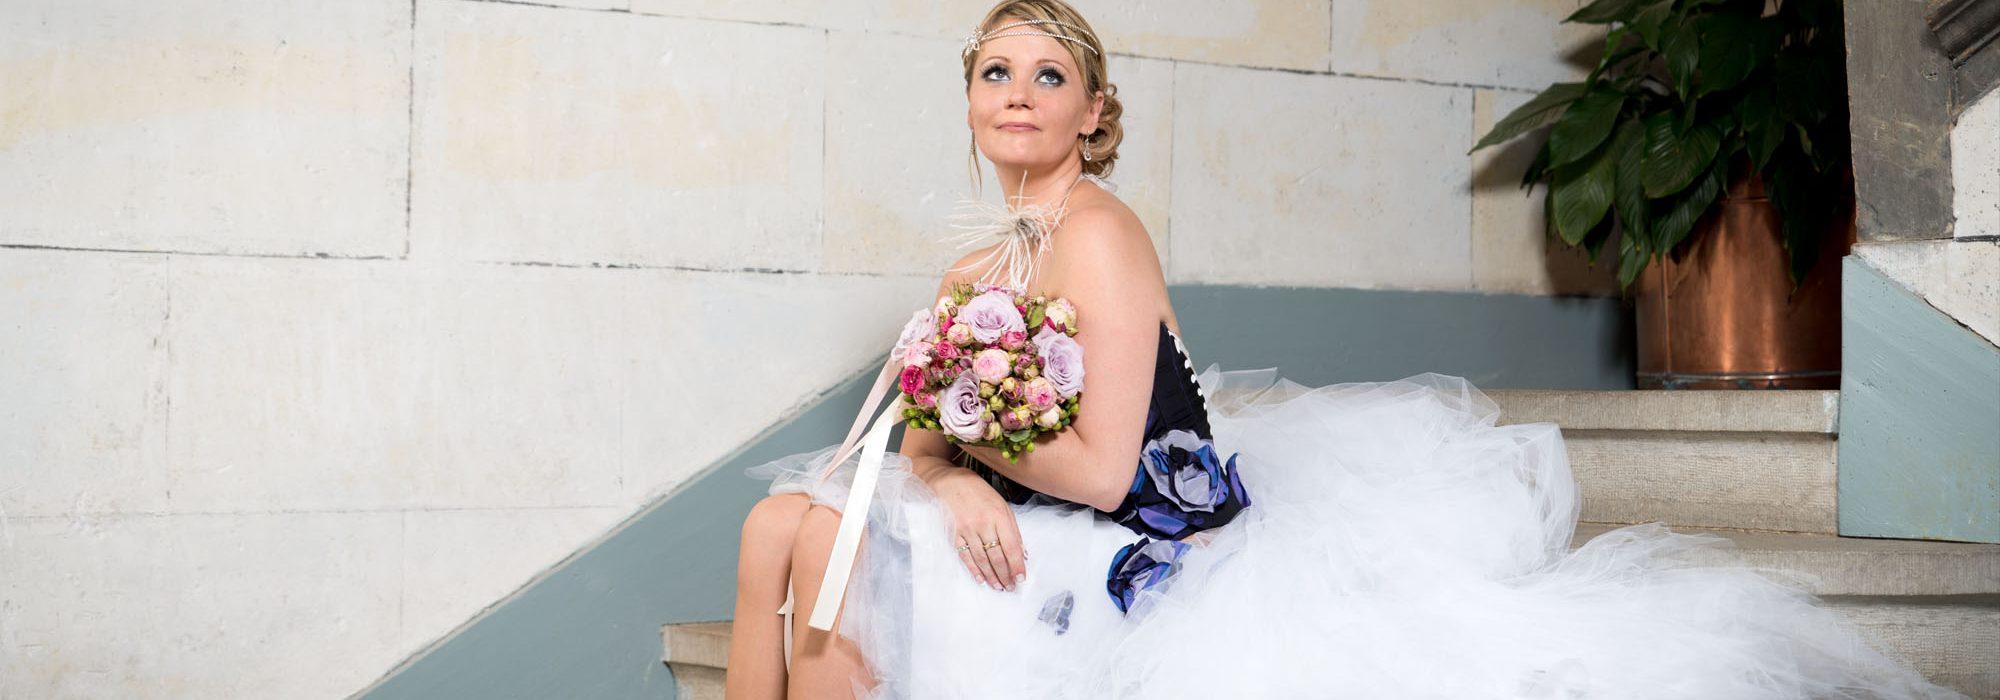 Photographe mariage Franche-Comte